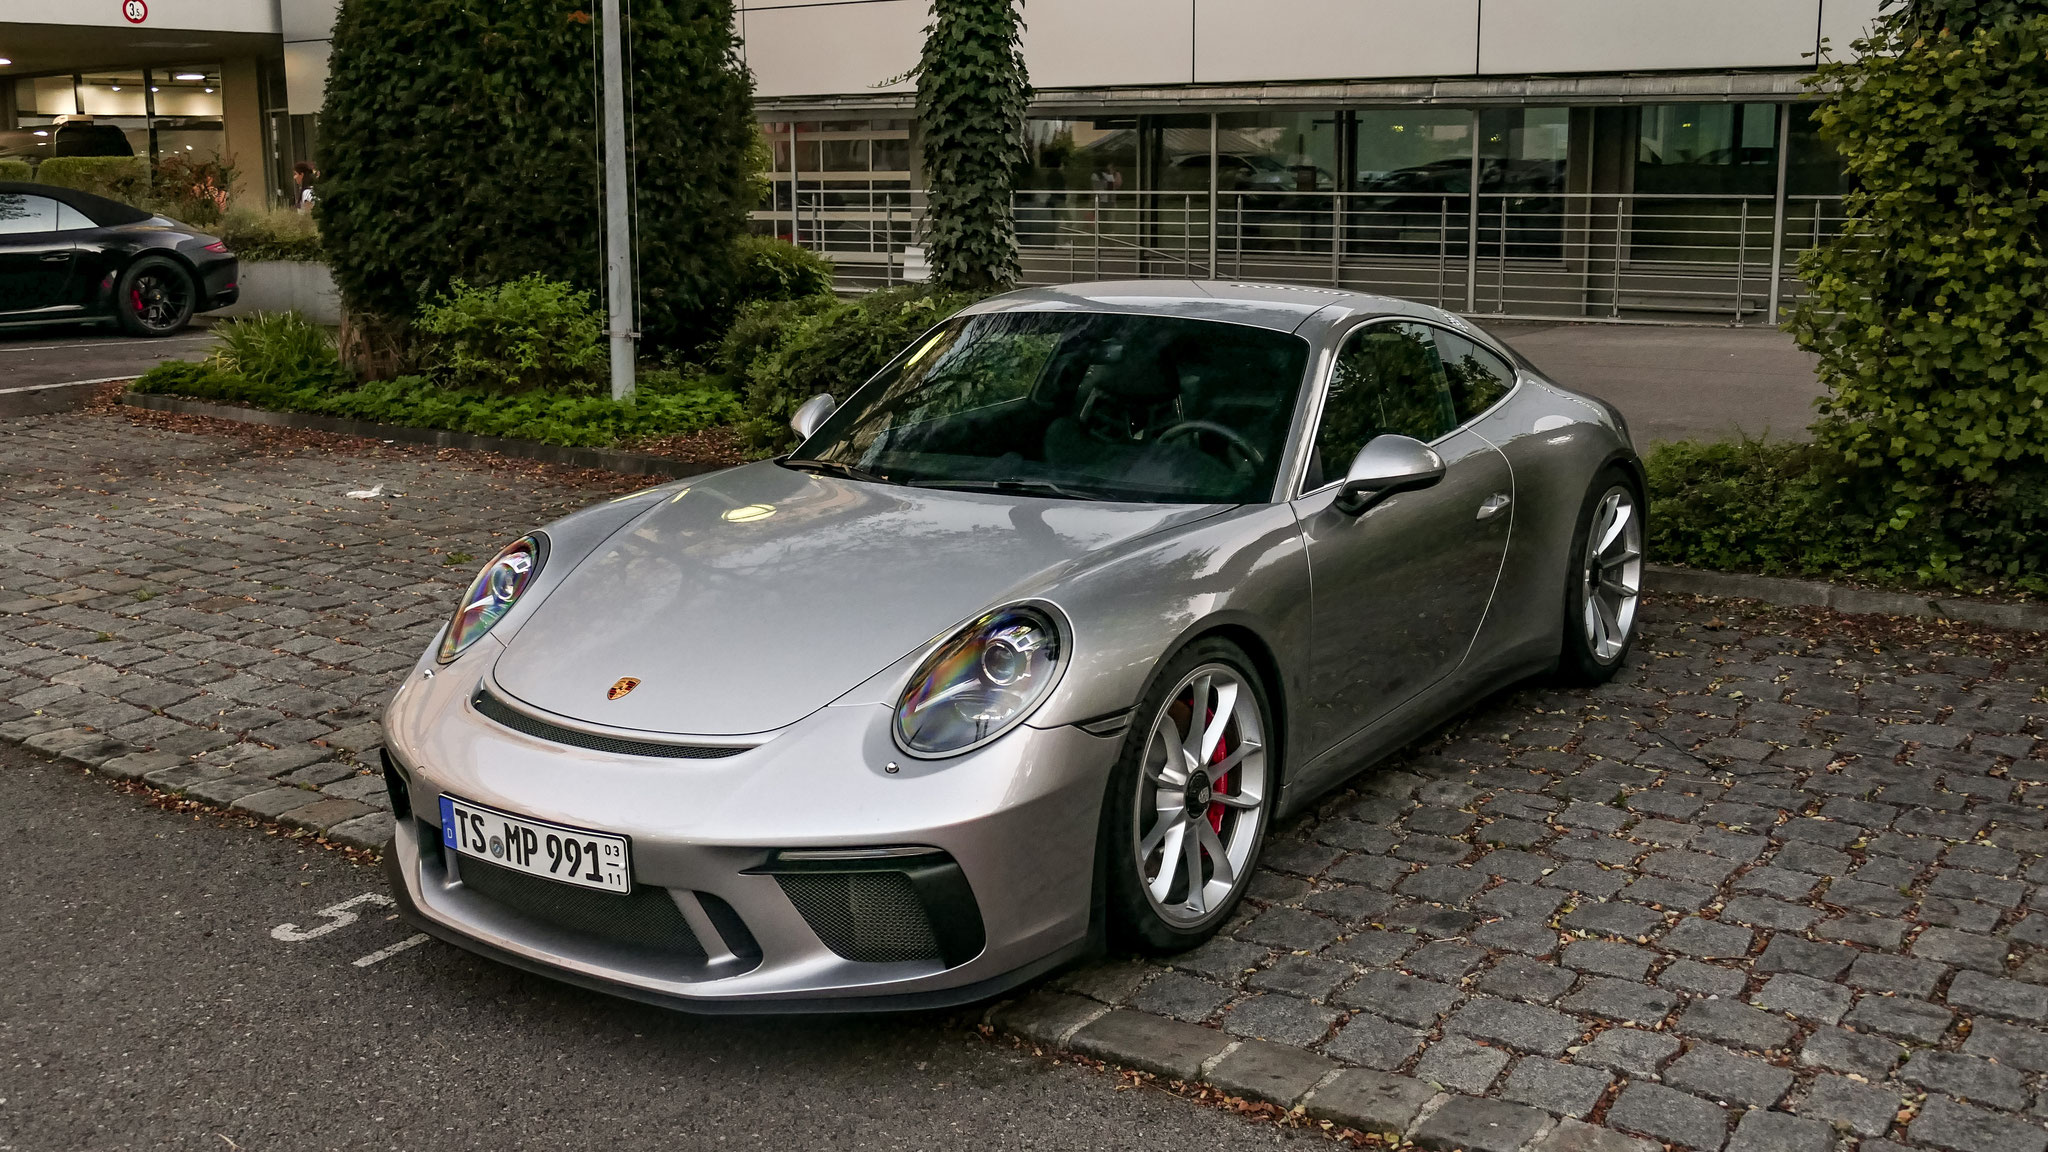 Porsche 991 GT3 Touring Package - TS-MP-991